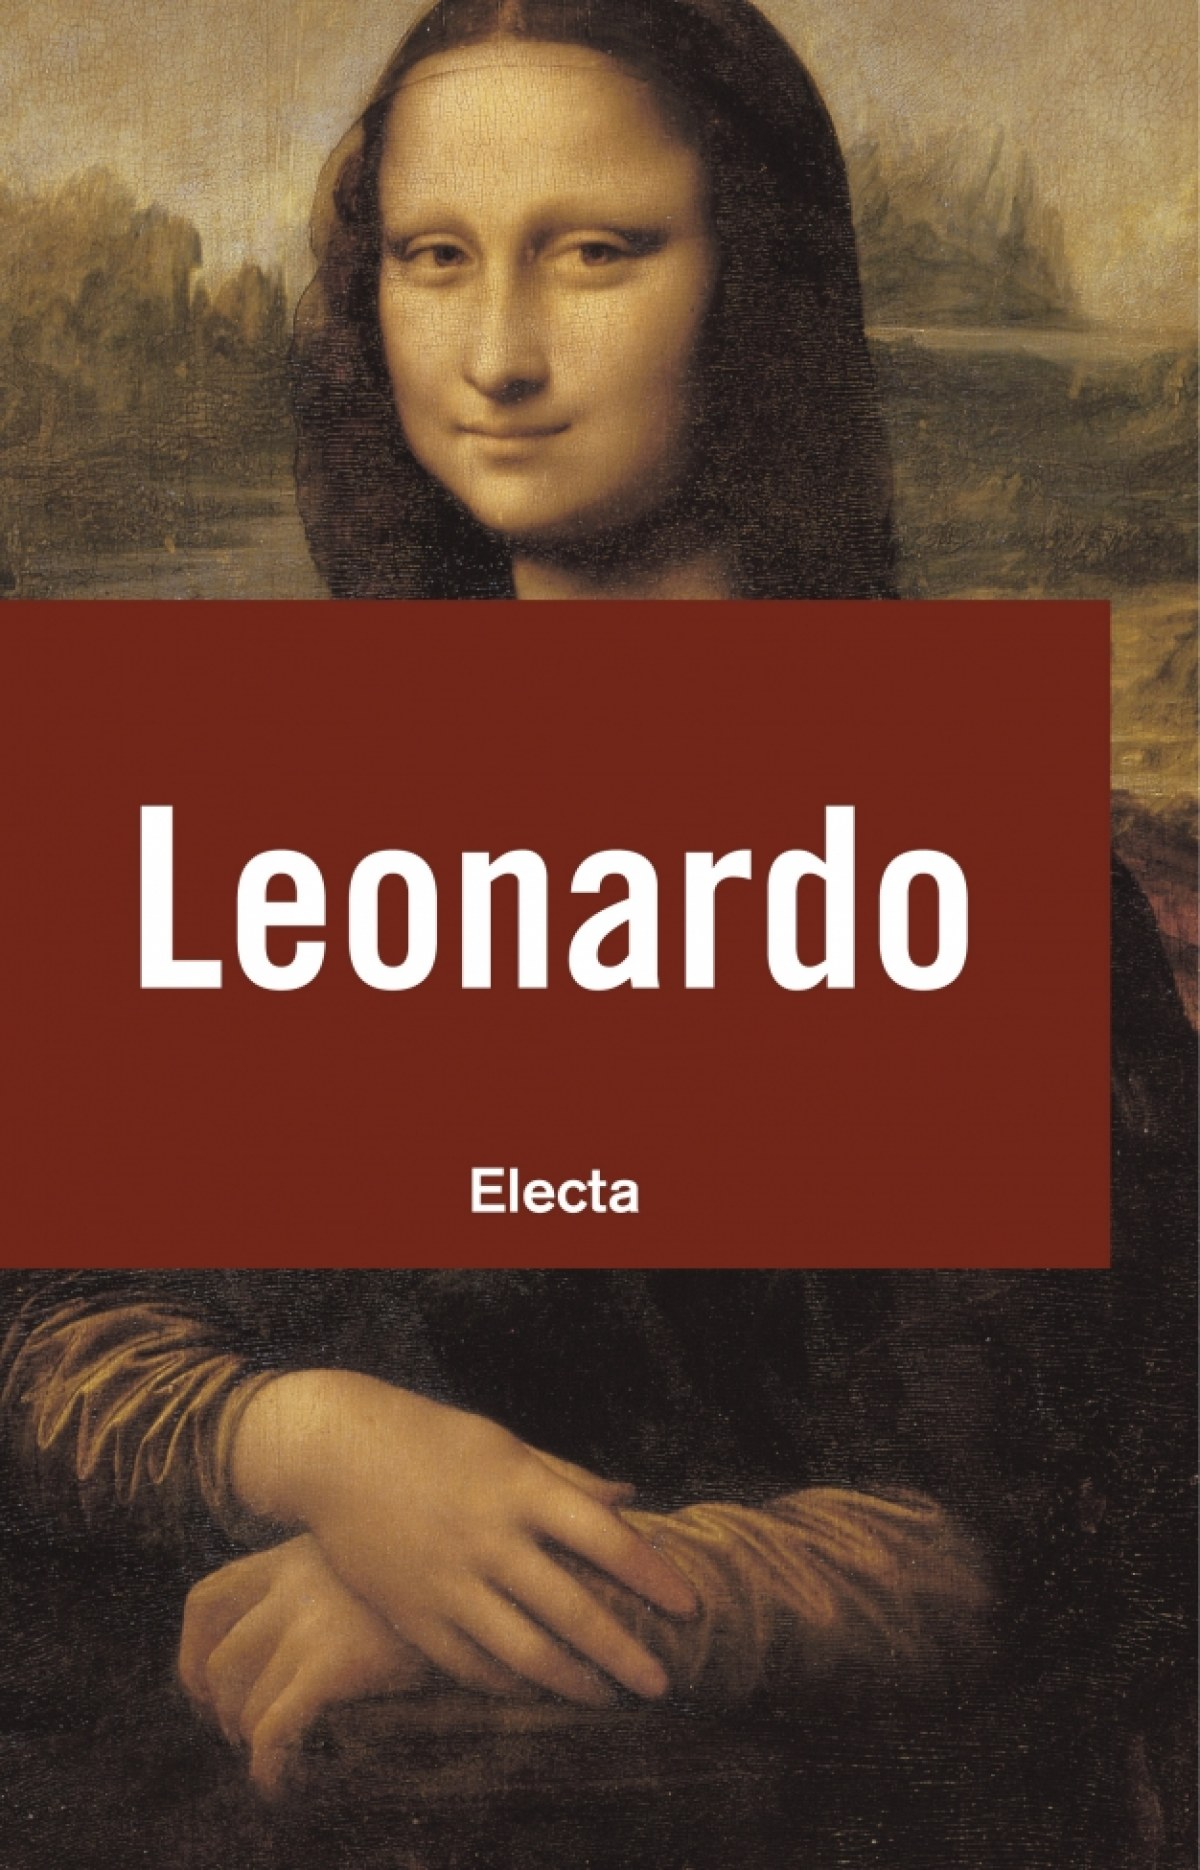 Leonardo - Devolini, F.